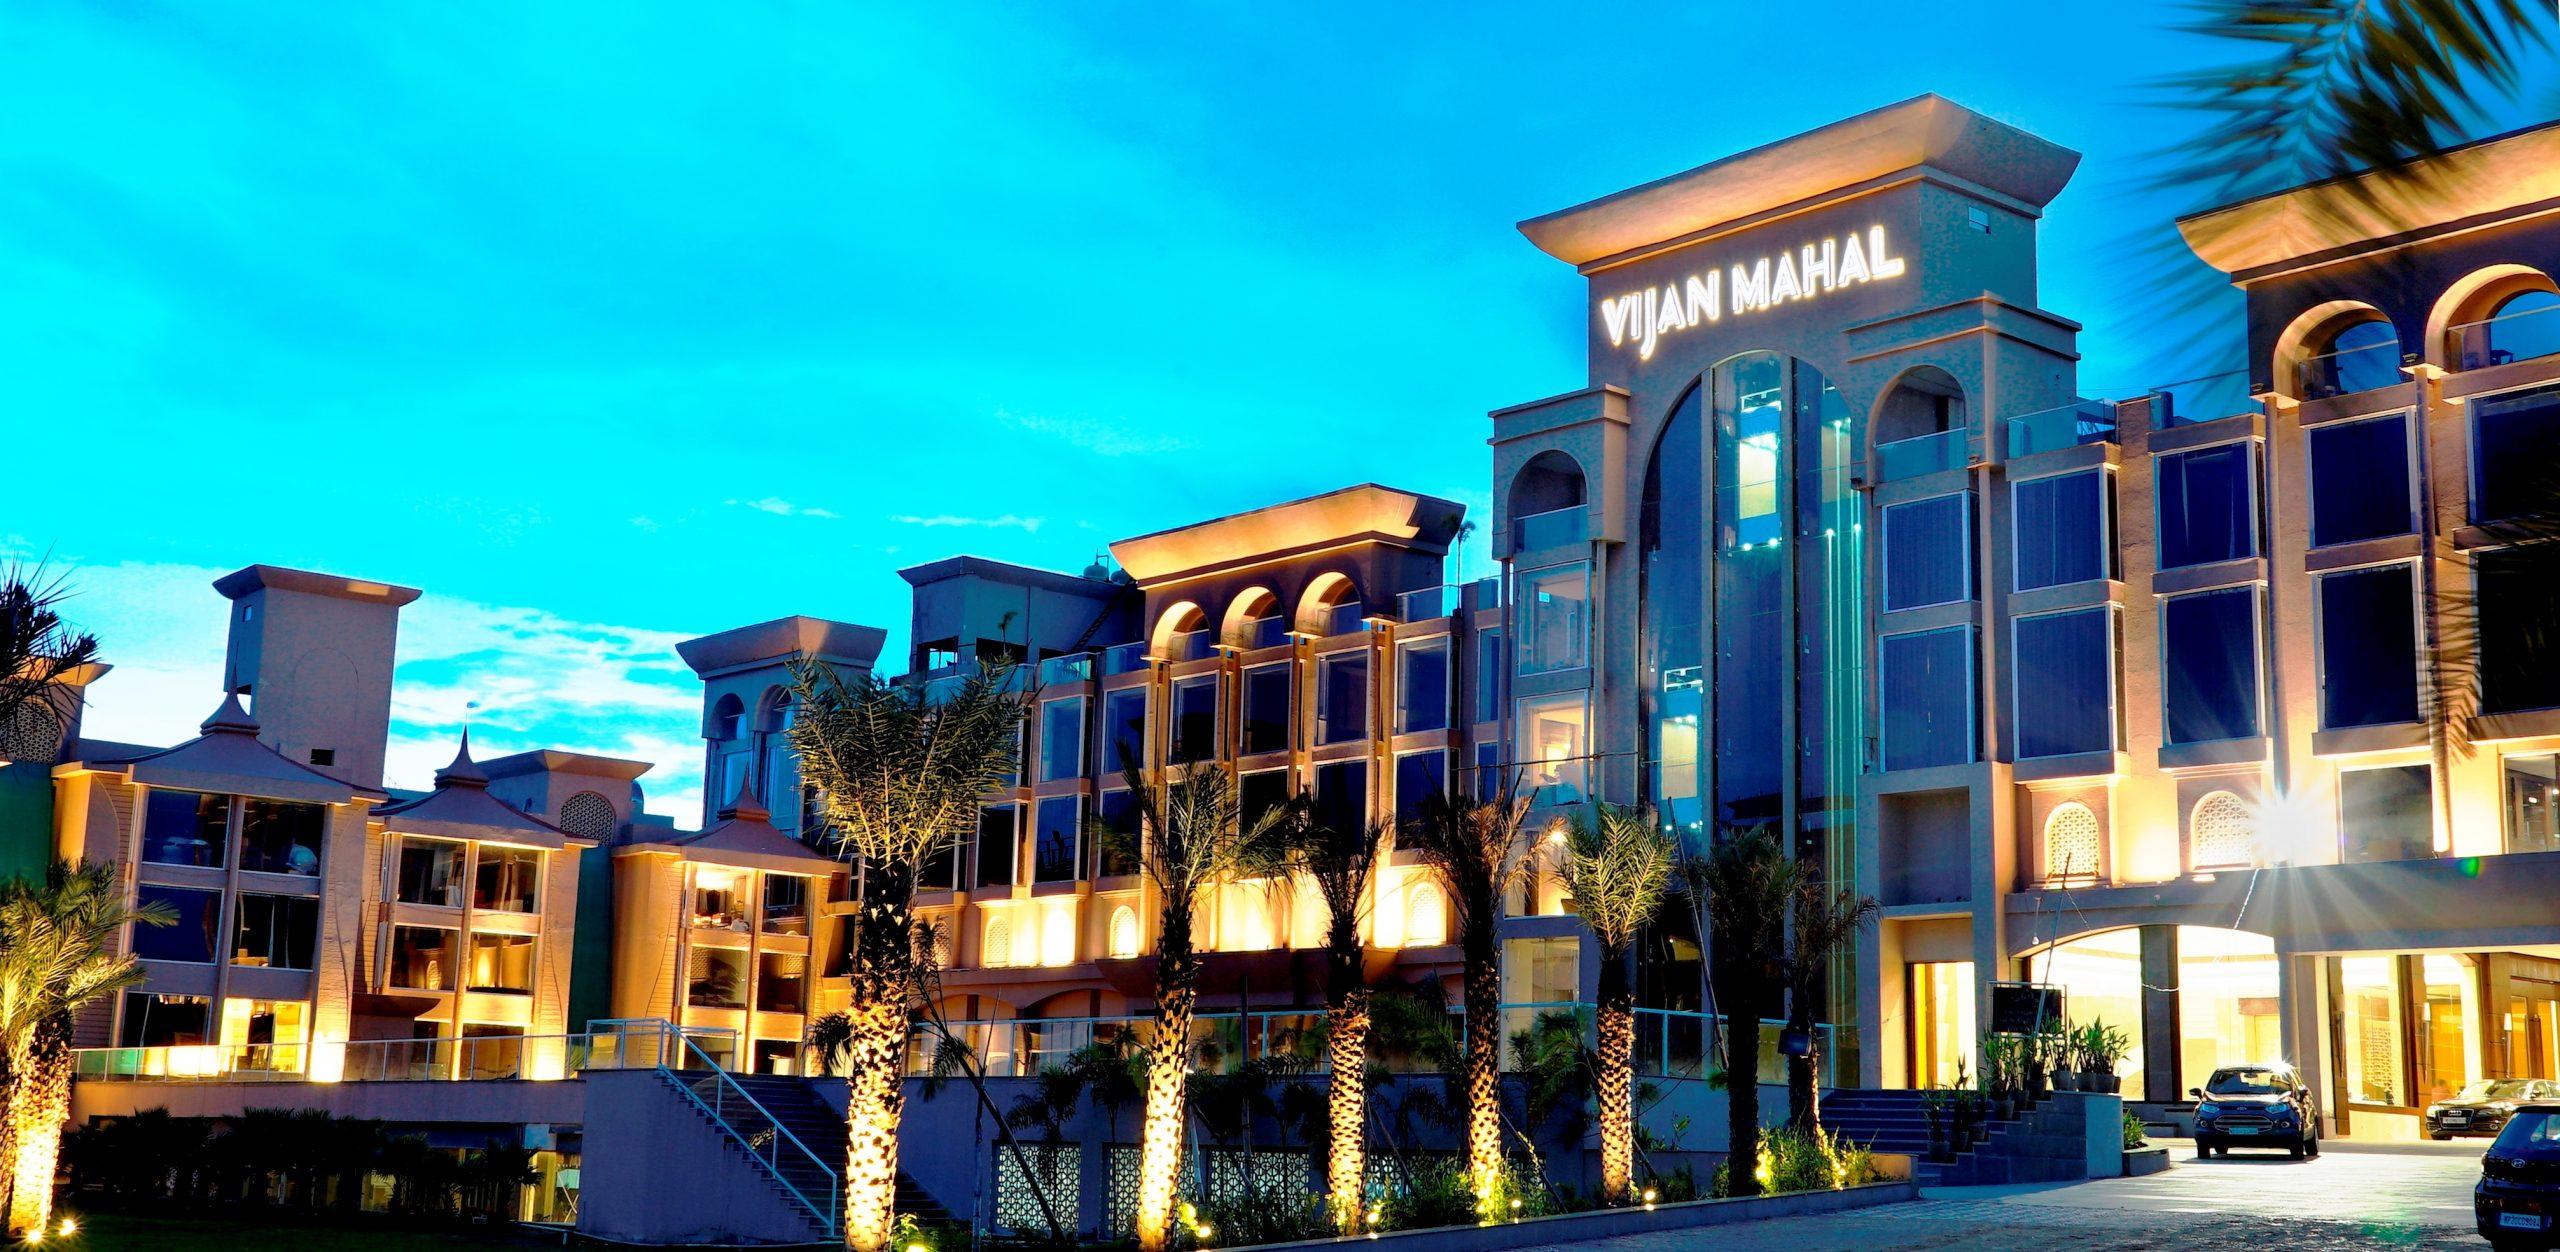 Vijan Mahal Hotel Best Hotel To Stay In Bhedaghat